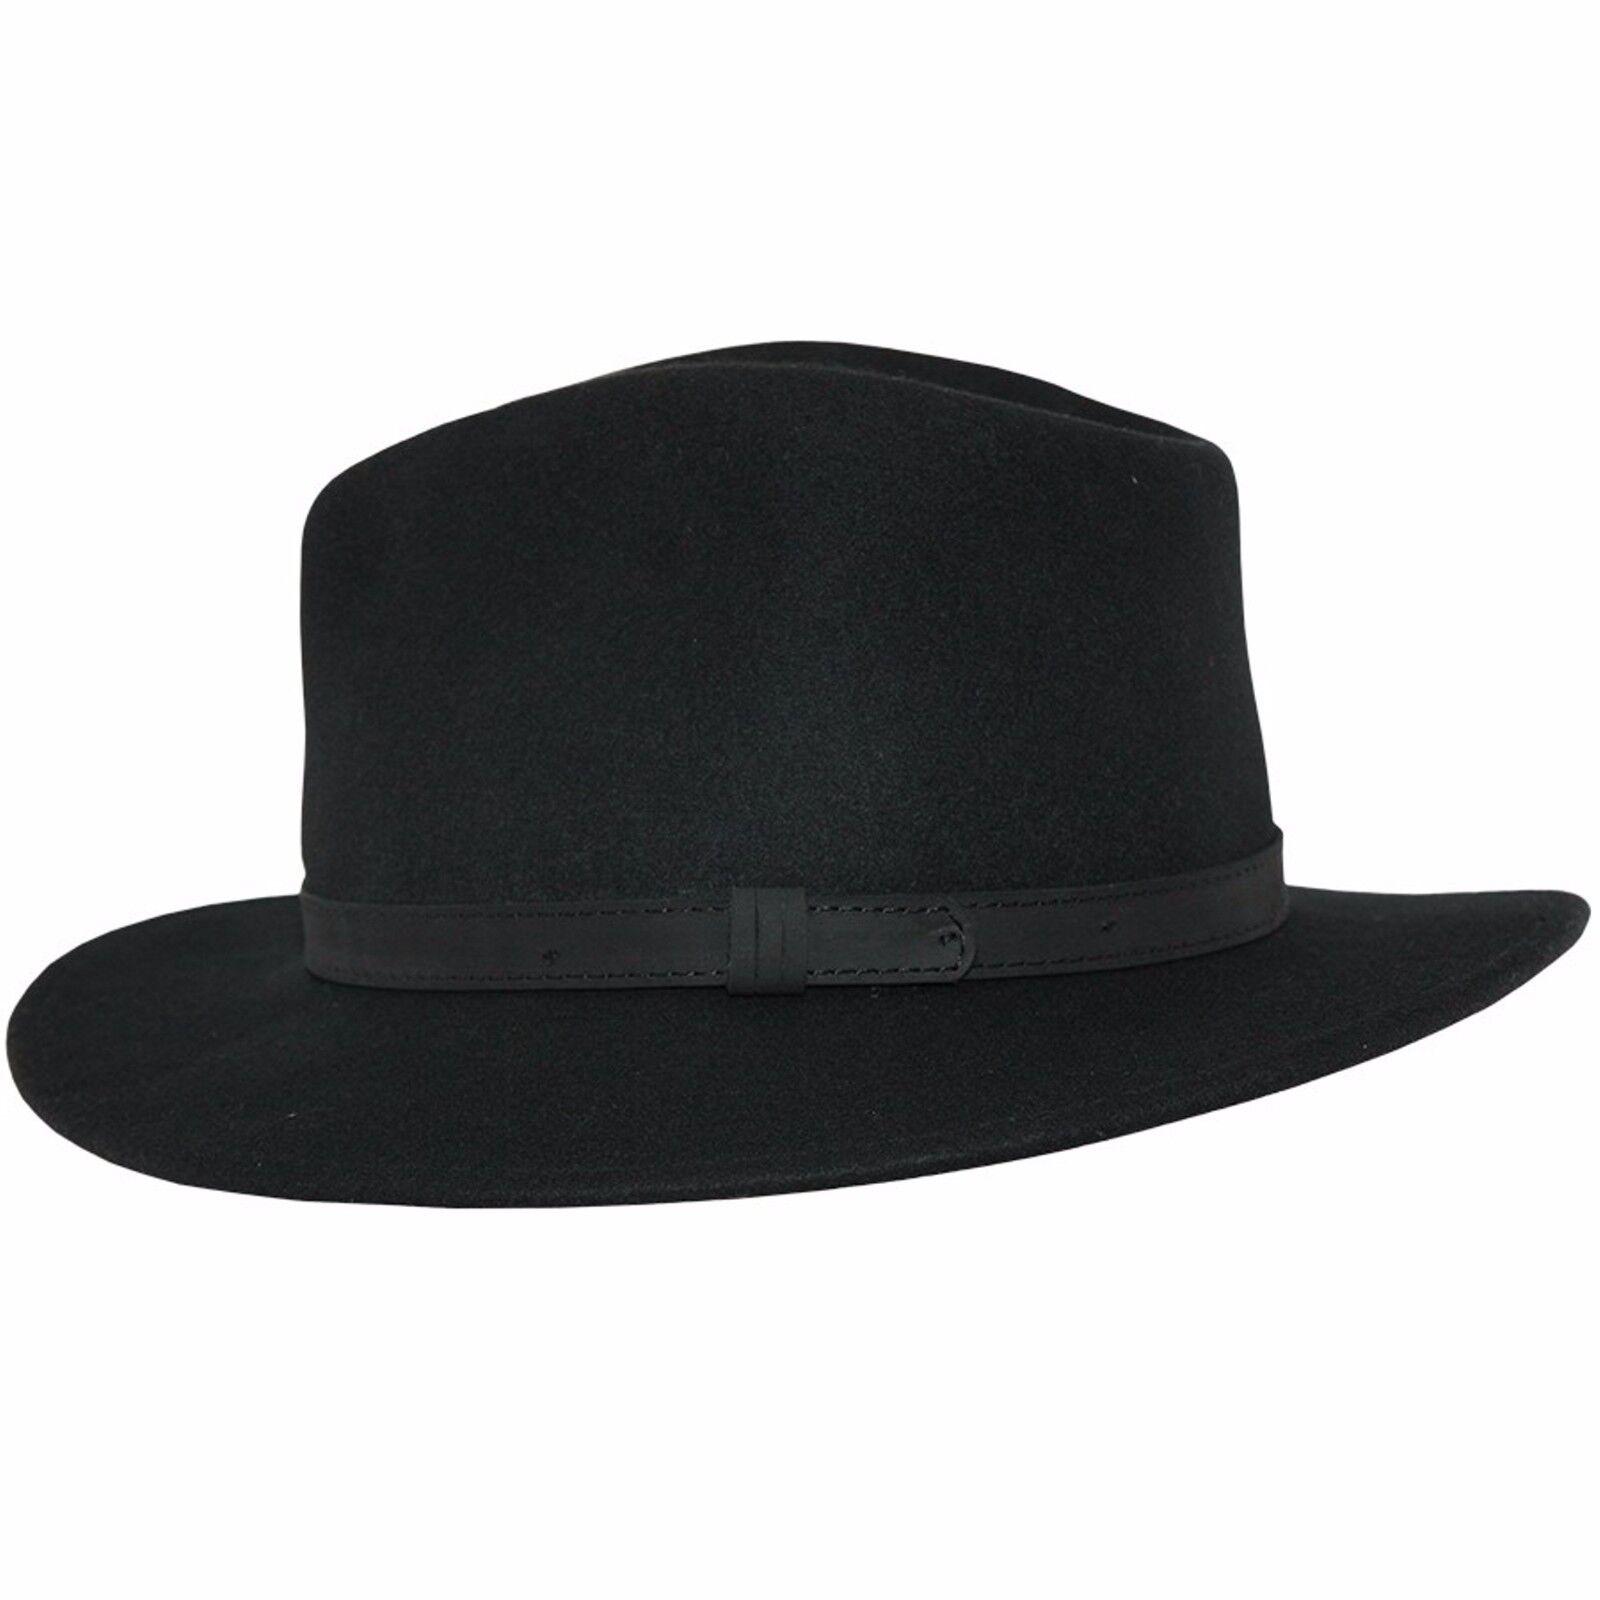 Negro deformable de caballeros 100% lana fieltro sombrero Fedora con cuero  tipo banda. b323d852305